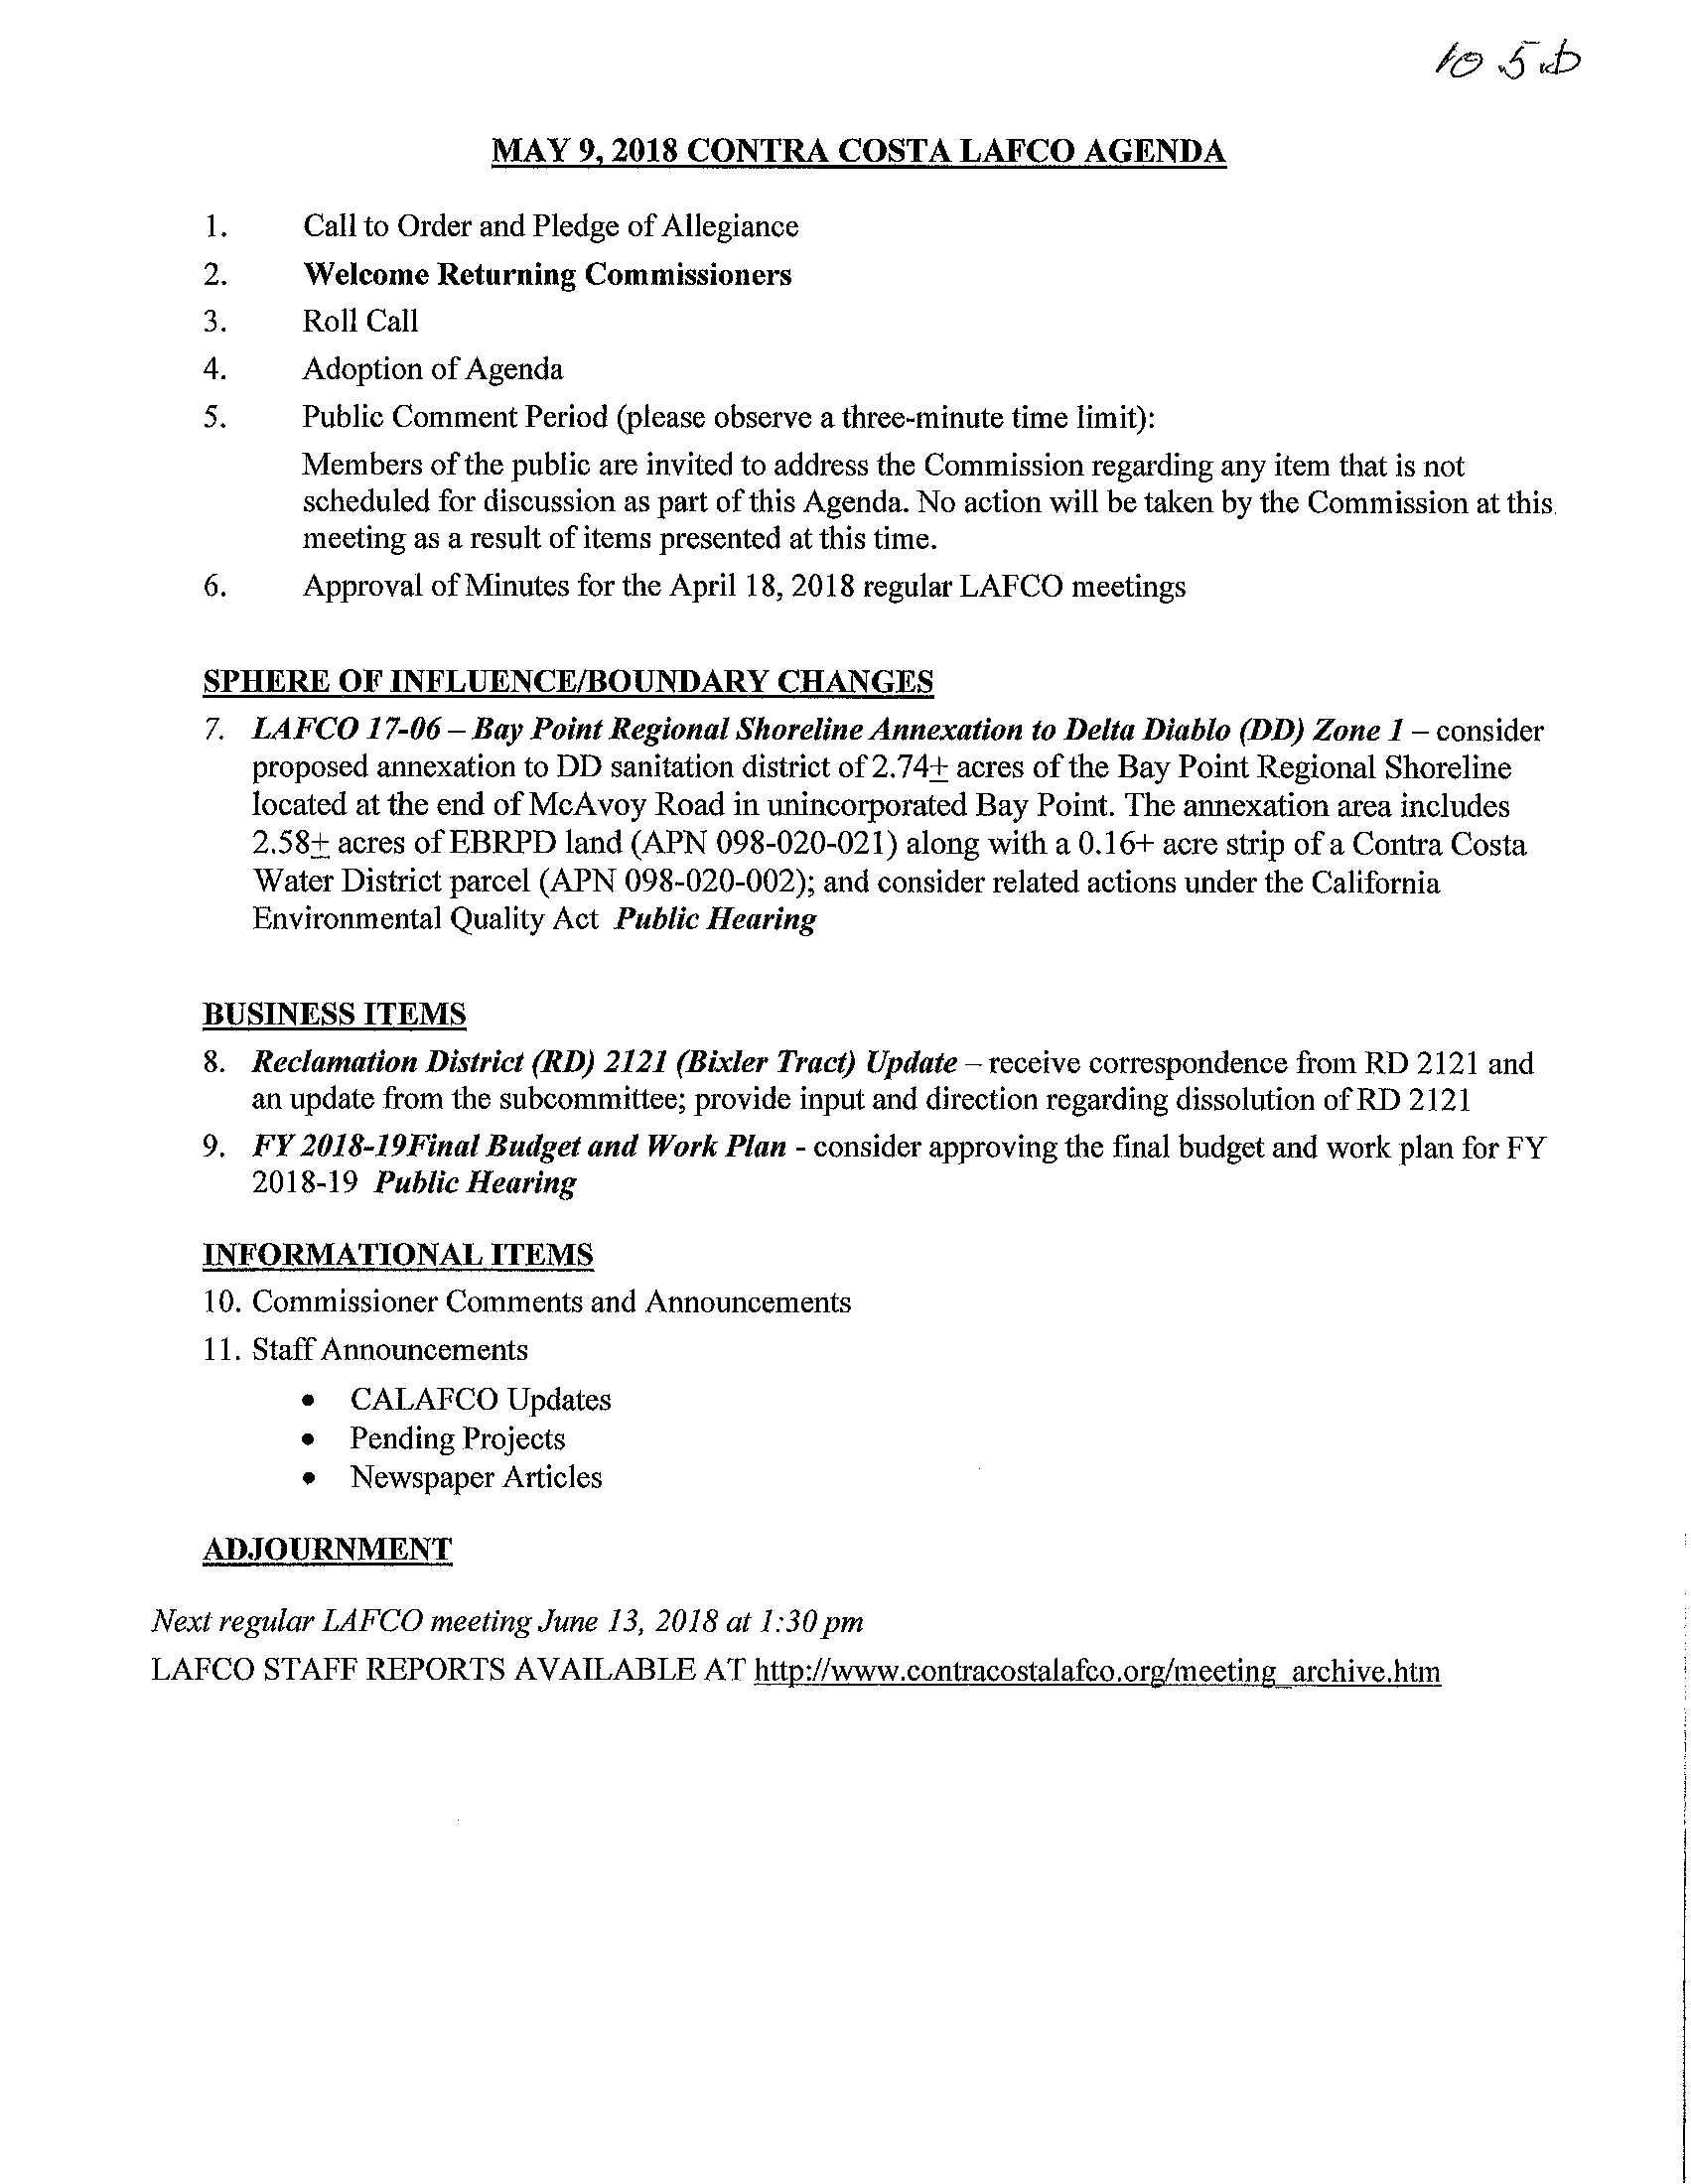 ESMAC Agenda 6.13.2018 (30 Pages)_30.jpg